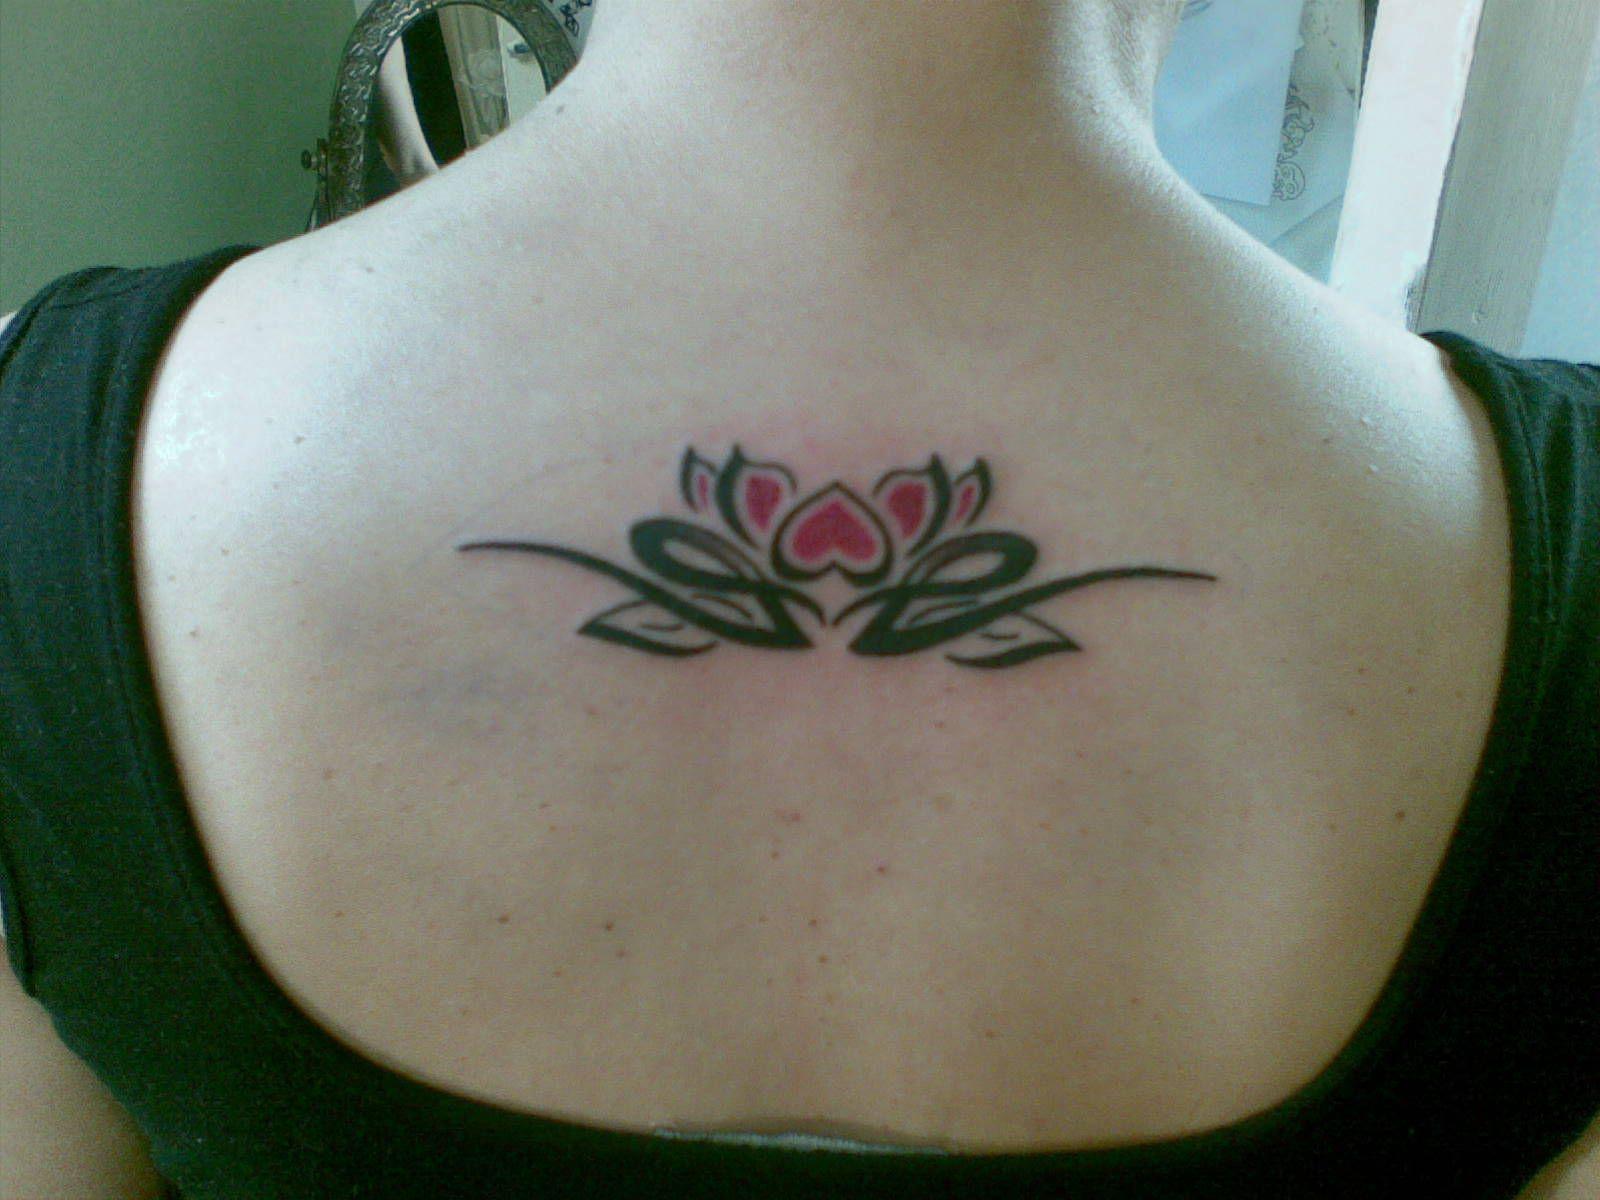 Lotus flower tattoo designs for more visit httpfashion1in1 lotus flower tattoo designs for more visit httpfashion1in1 izmirmasajfo